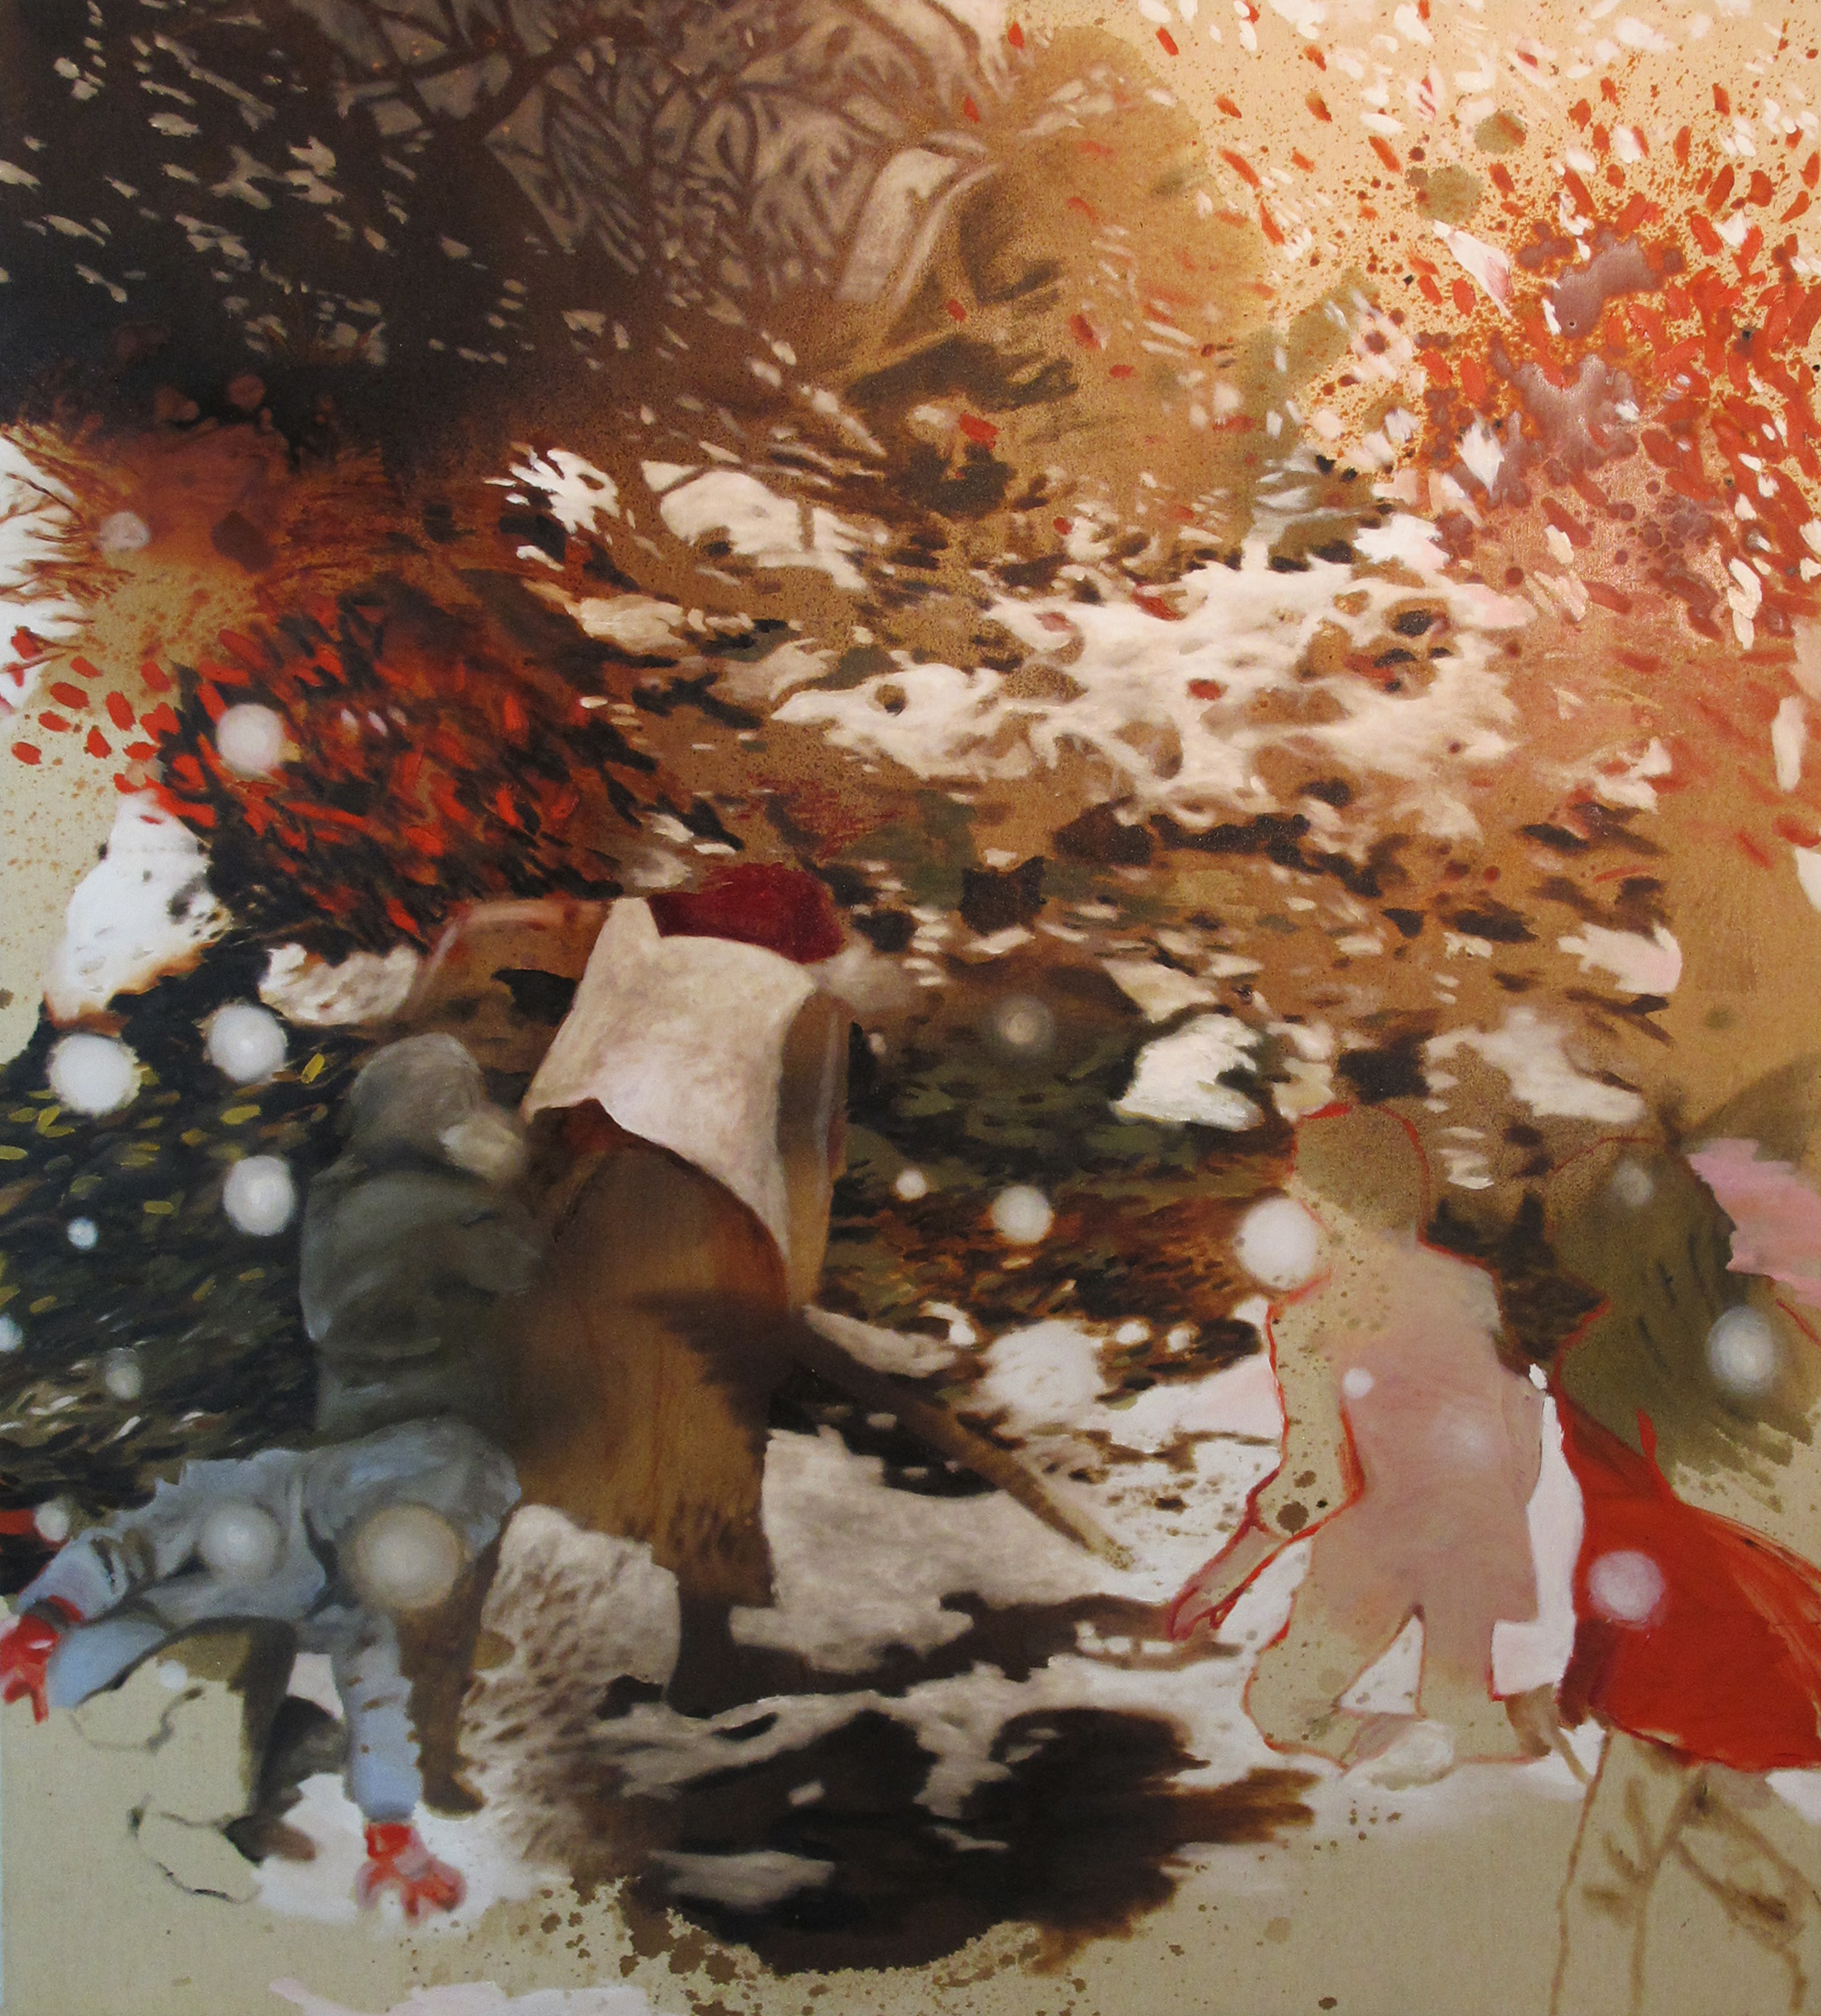 2. Zanbagh Lotfi, Memory Vague, 2015. Tecnica mista e olio su tela, 150 x 135 cm.